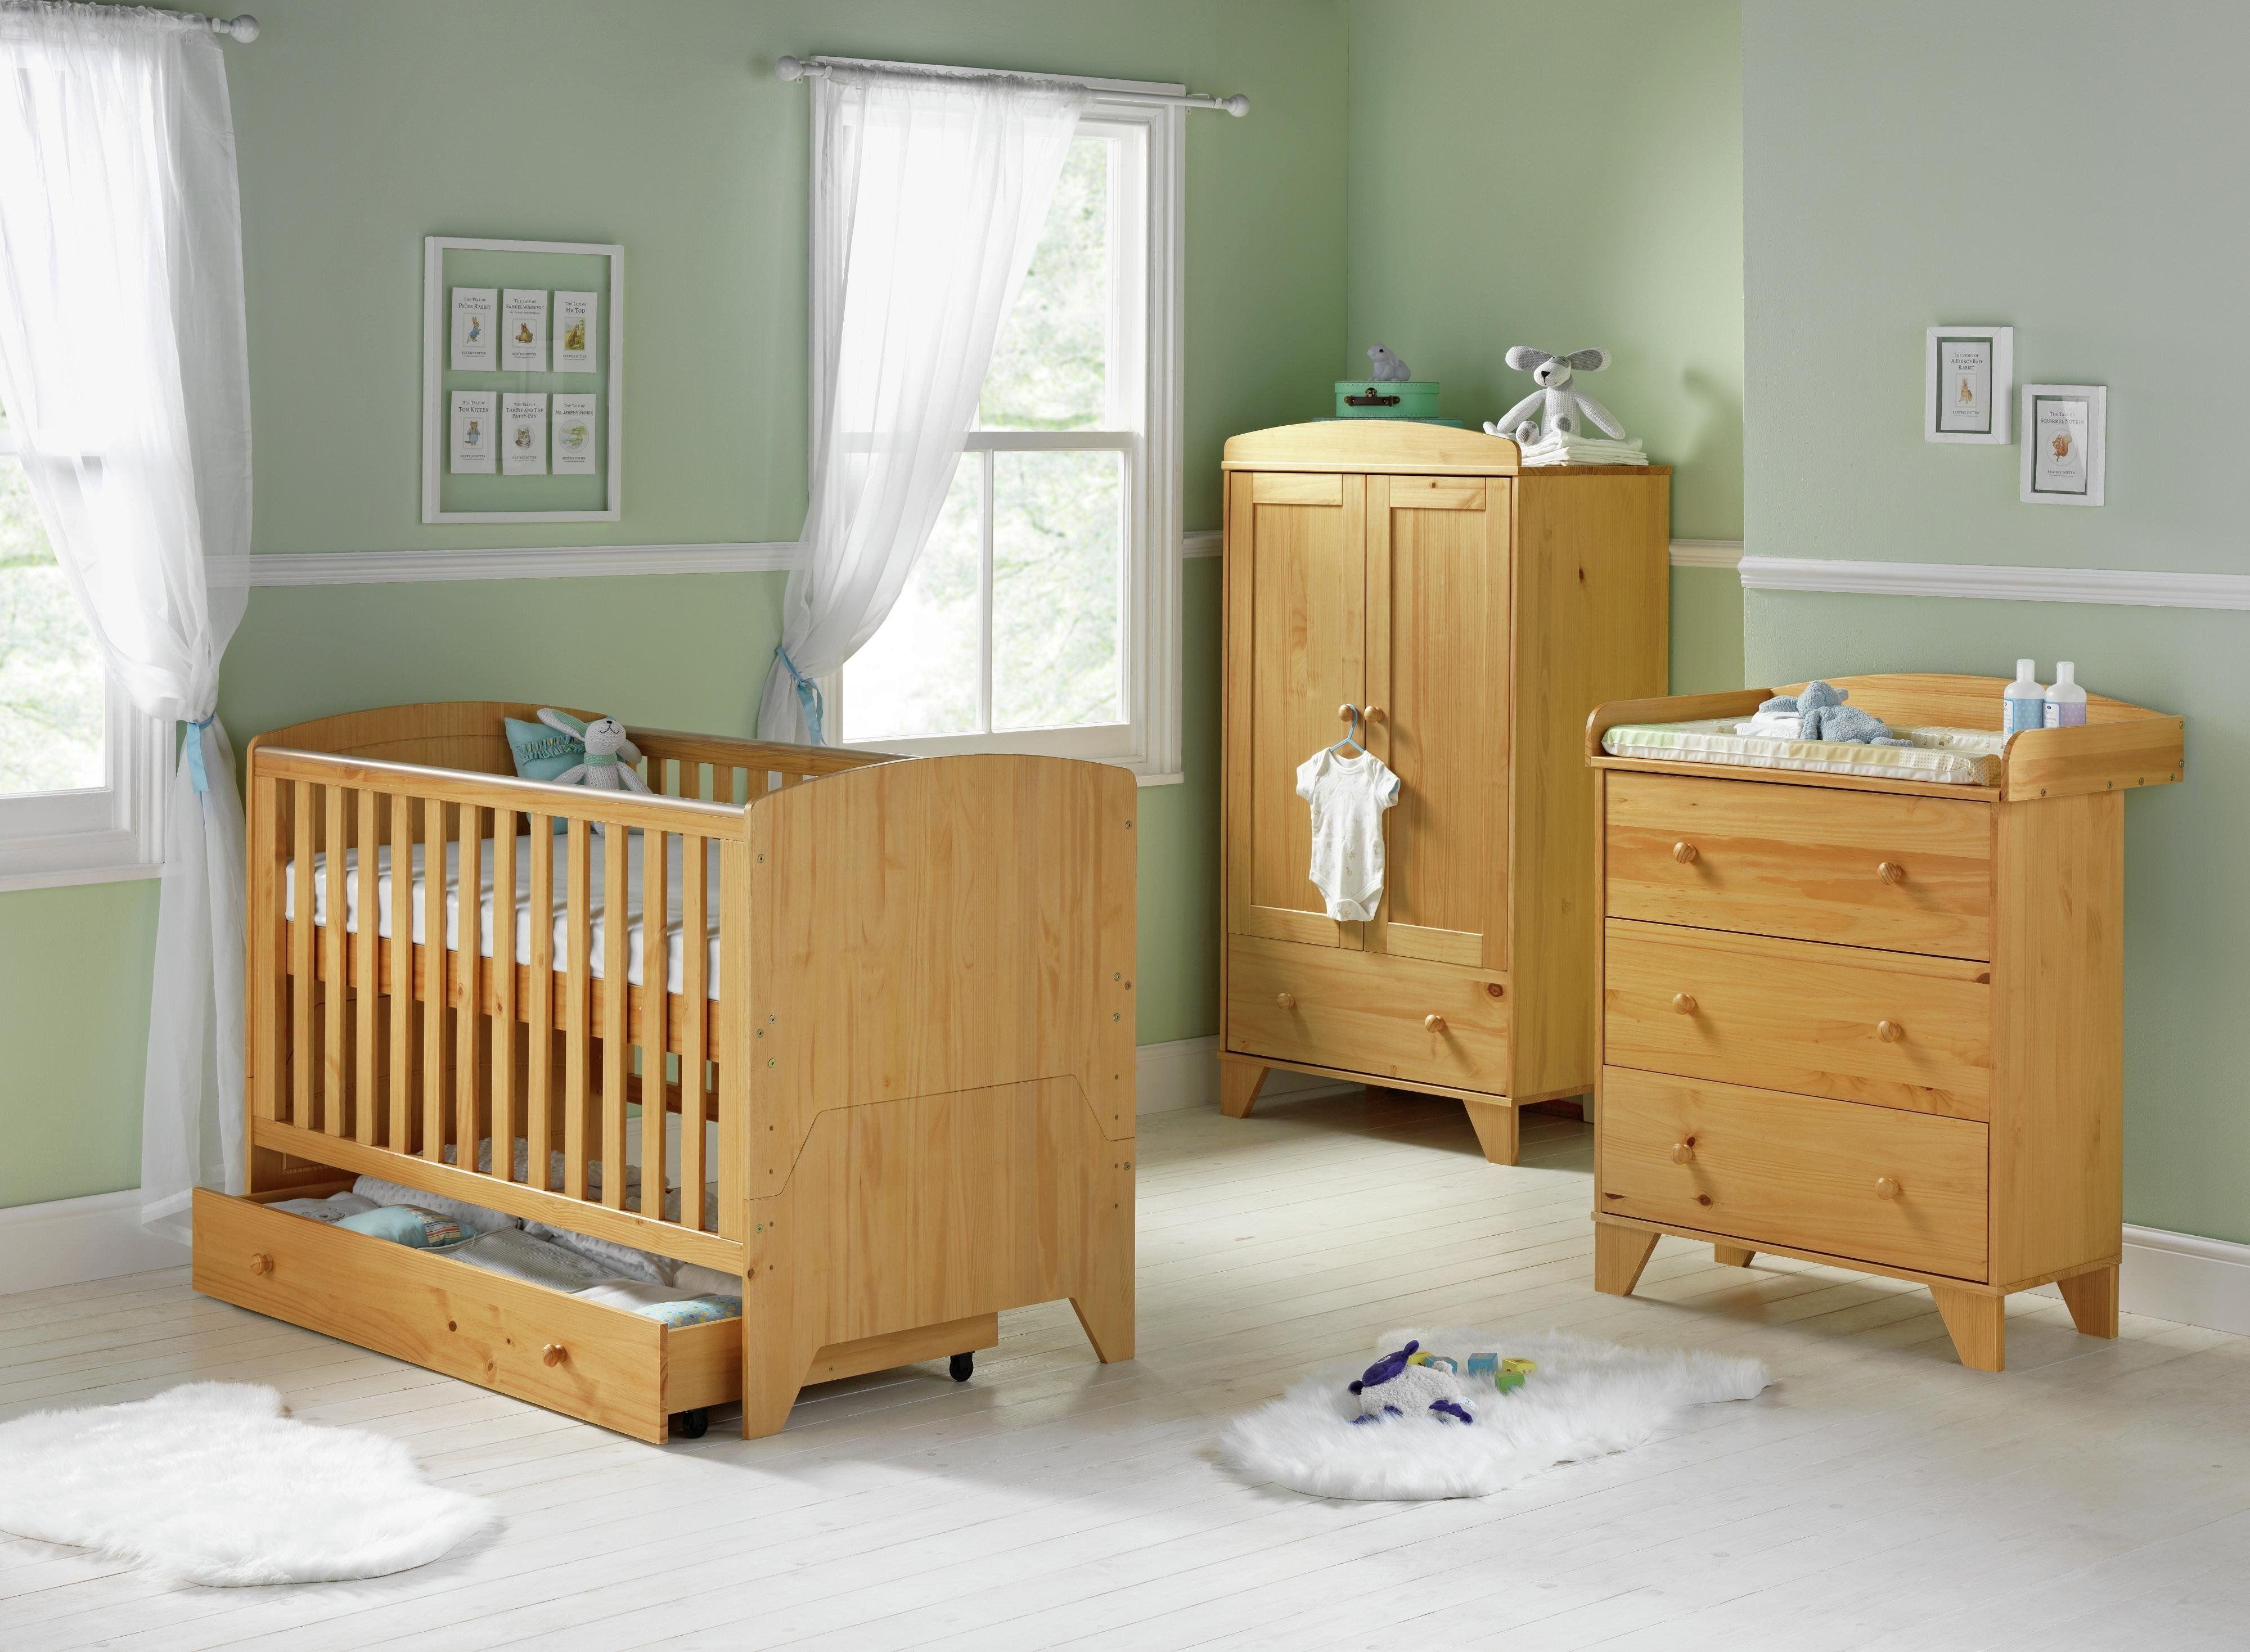 249 99 Babystart New Oxford 5 Piece Furniture Set Pine Baby Deals Of The Day Uk